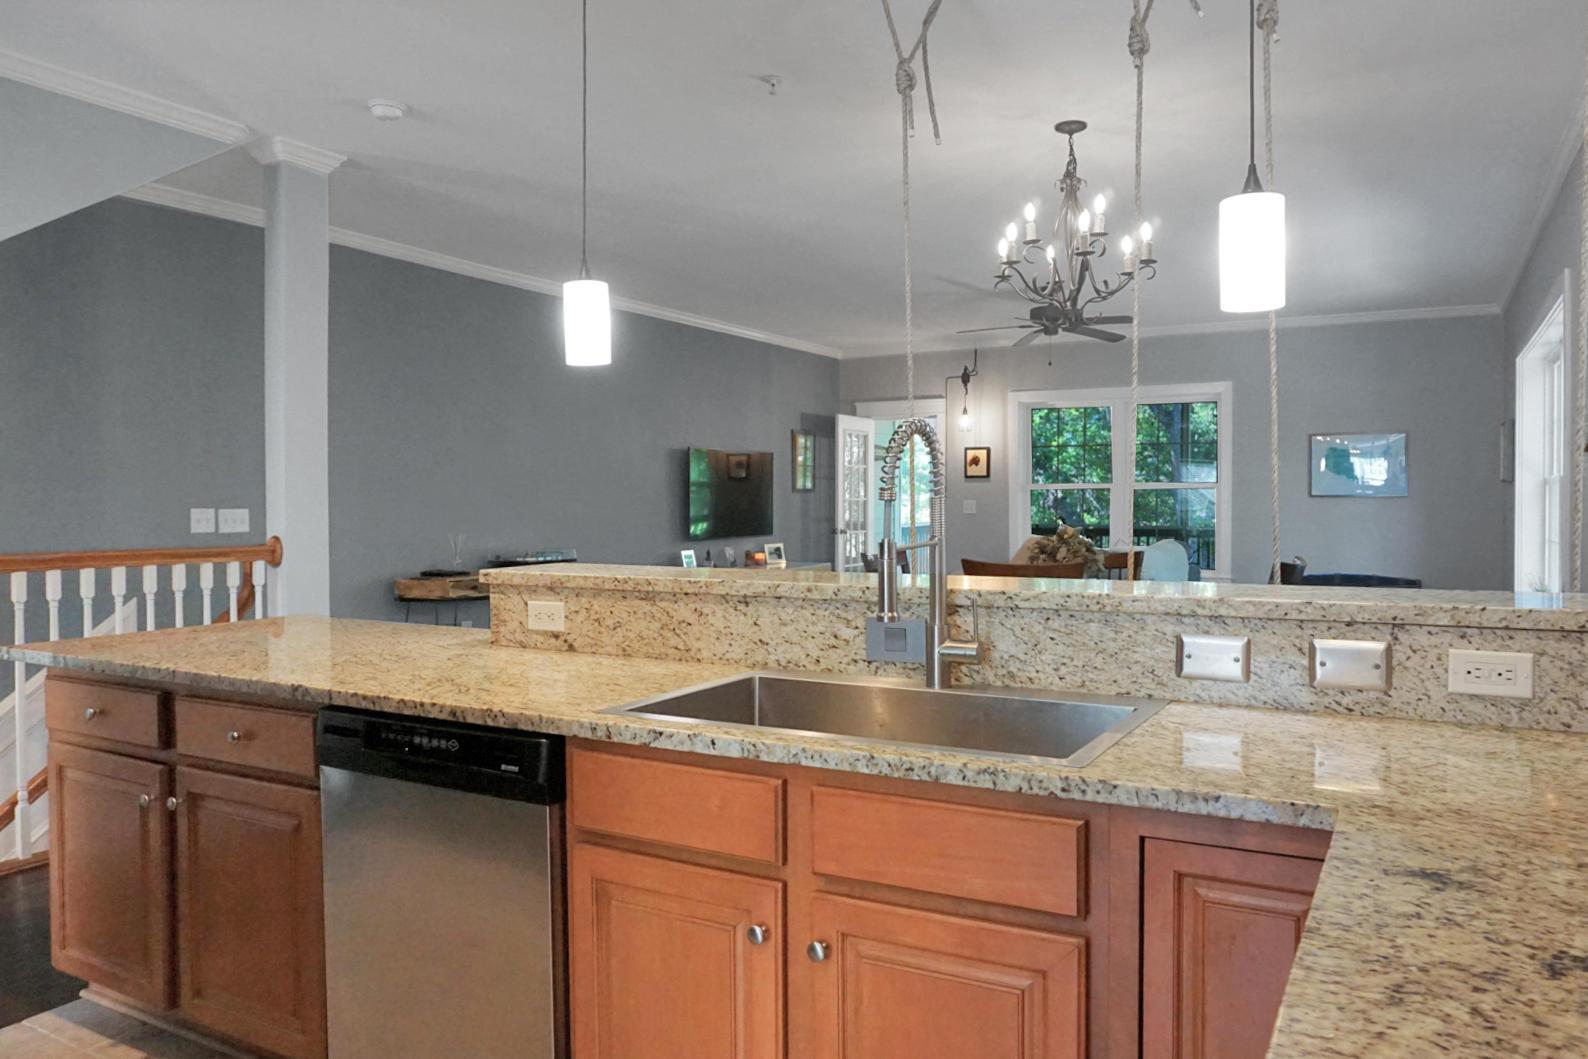 Etiwan Pointe Homes For Sale - 269 Etiwan Pointe, Mount Pleasant, SC - 60